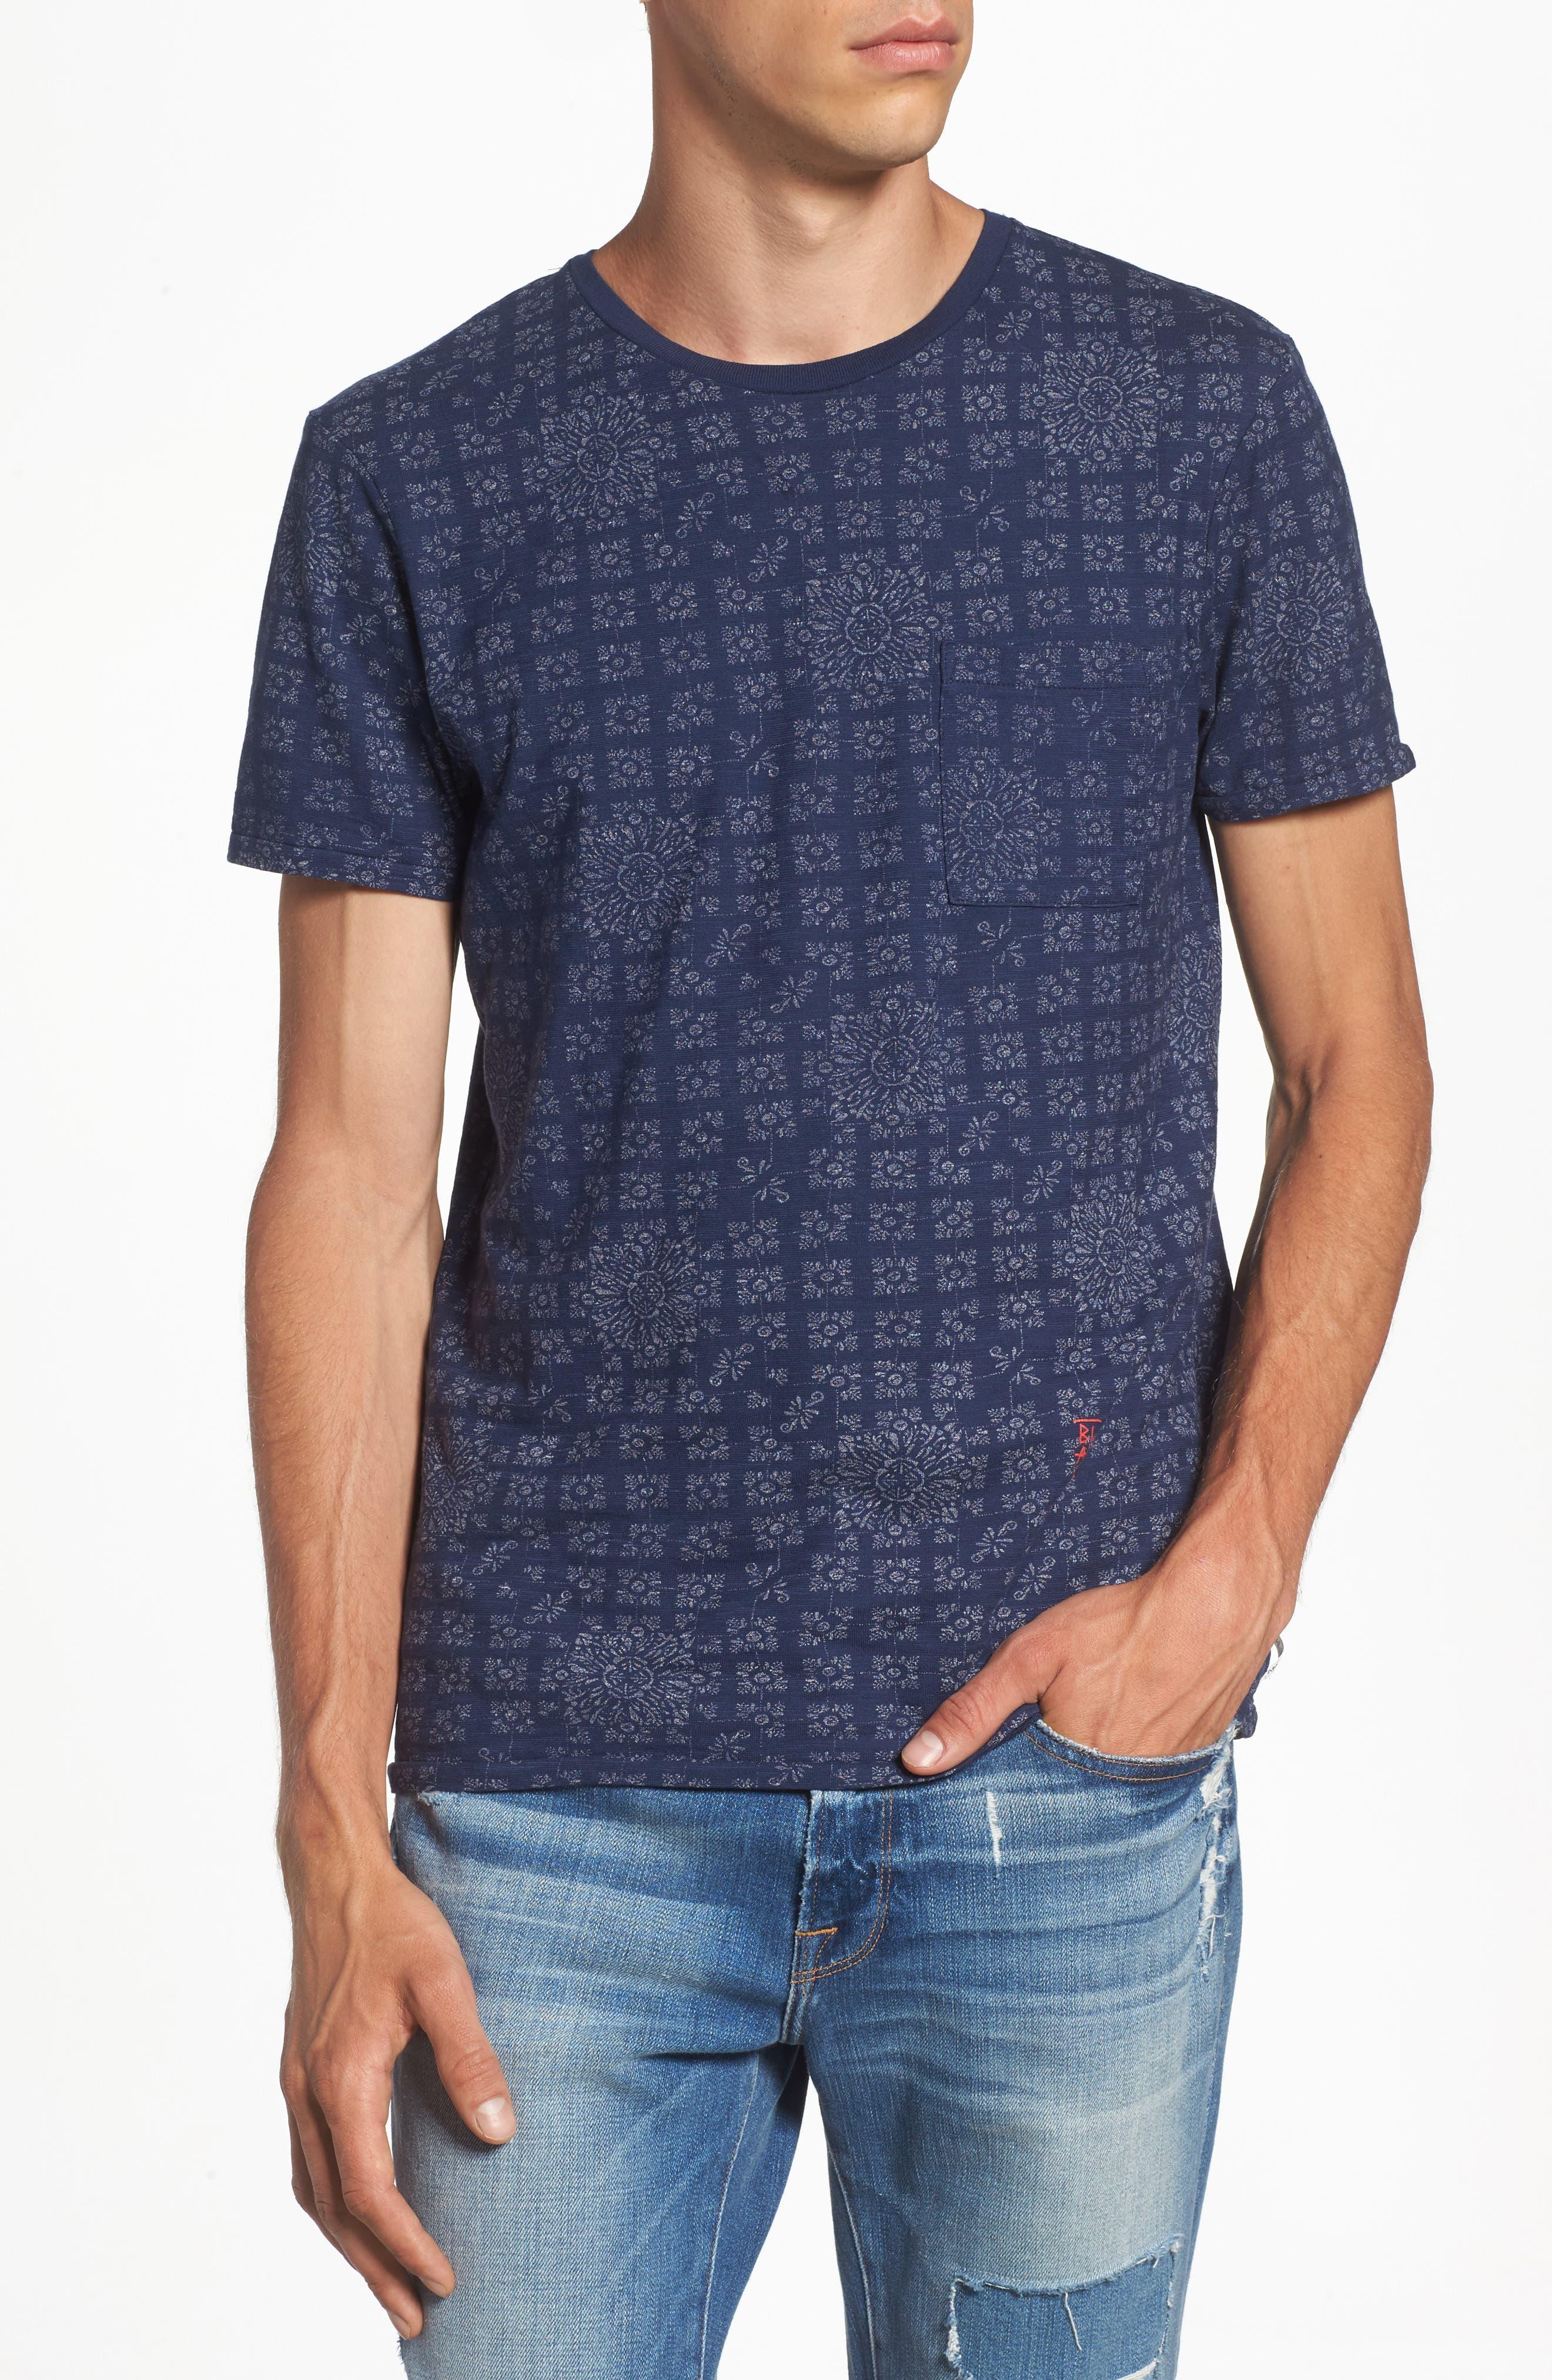 AMS Graphic T-Shirt,                         Main,                         color, Combo D